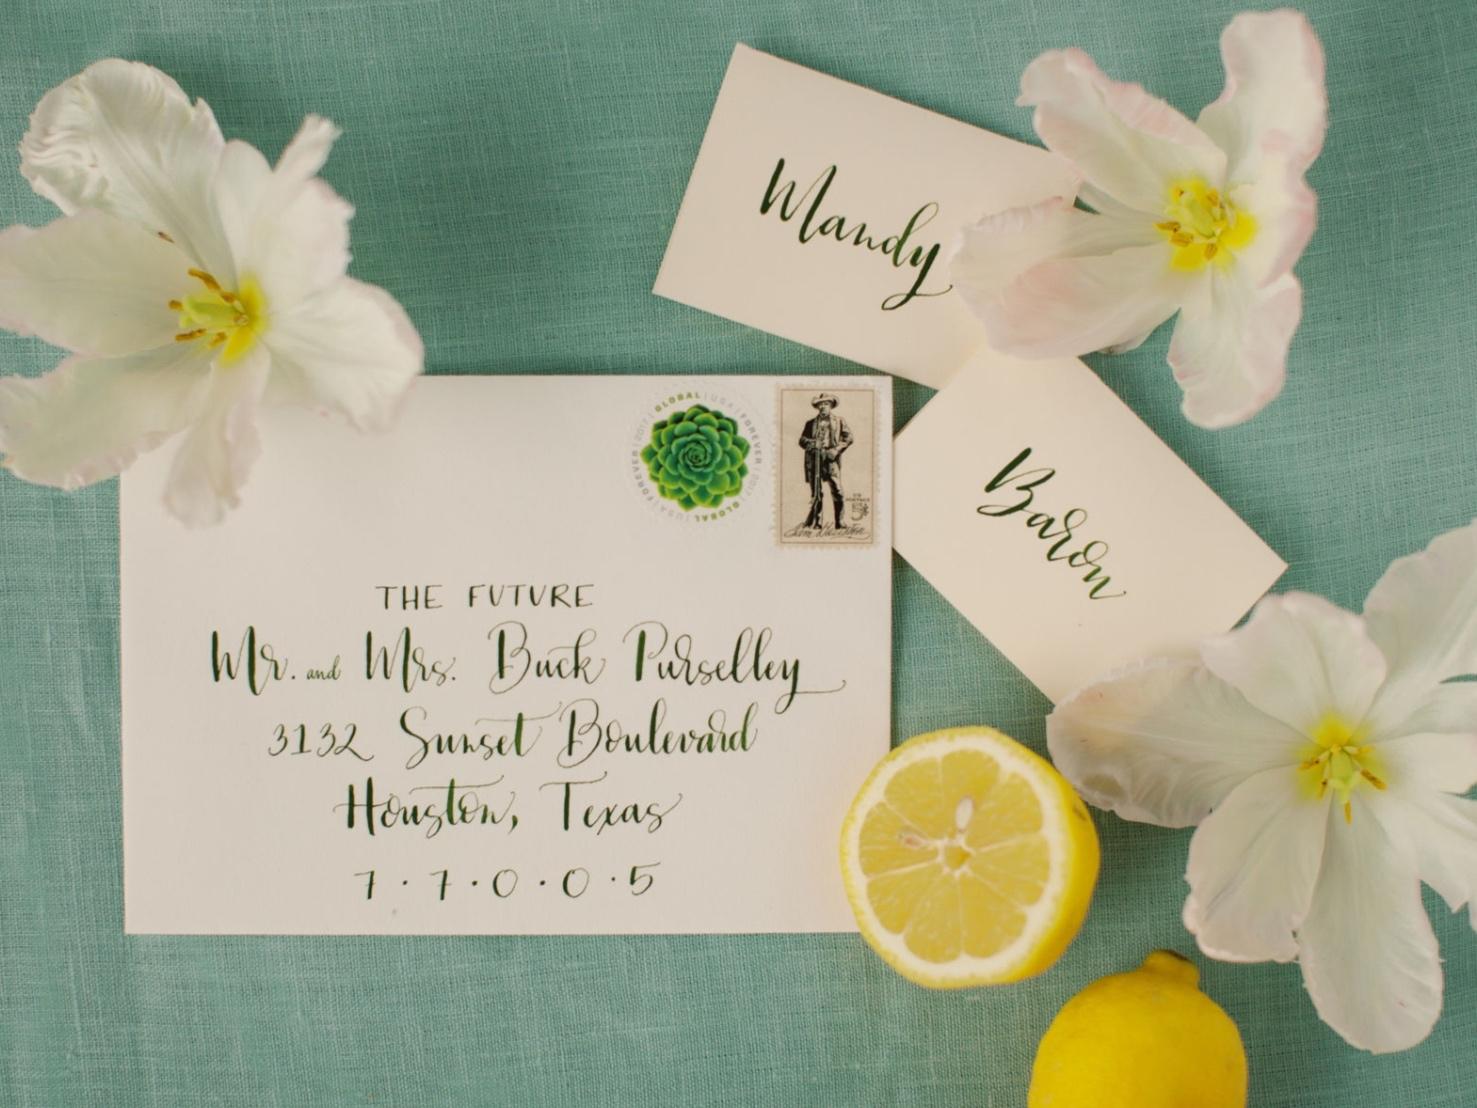 spring themed wedding invitation with lemon motif